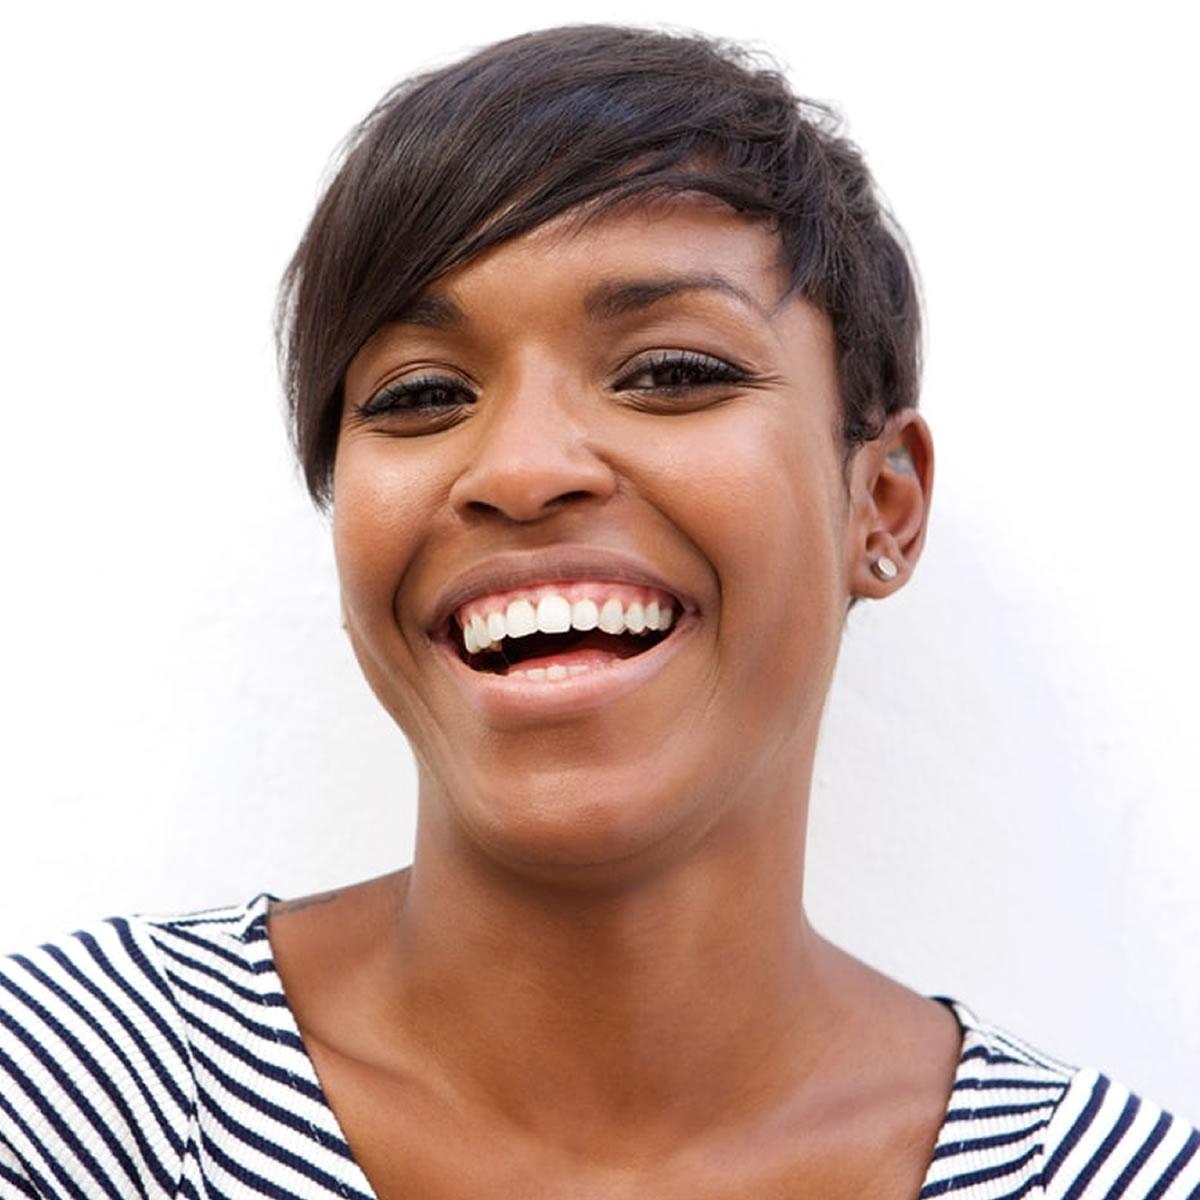 New very short pixie hairstyles 2019-black woman favorite... 1